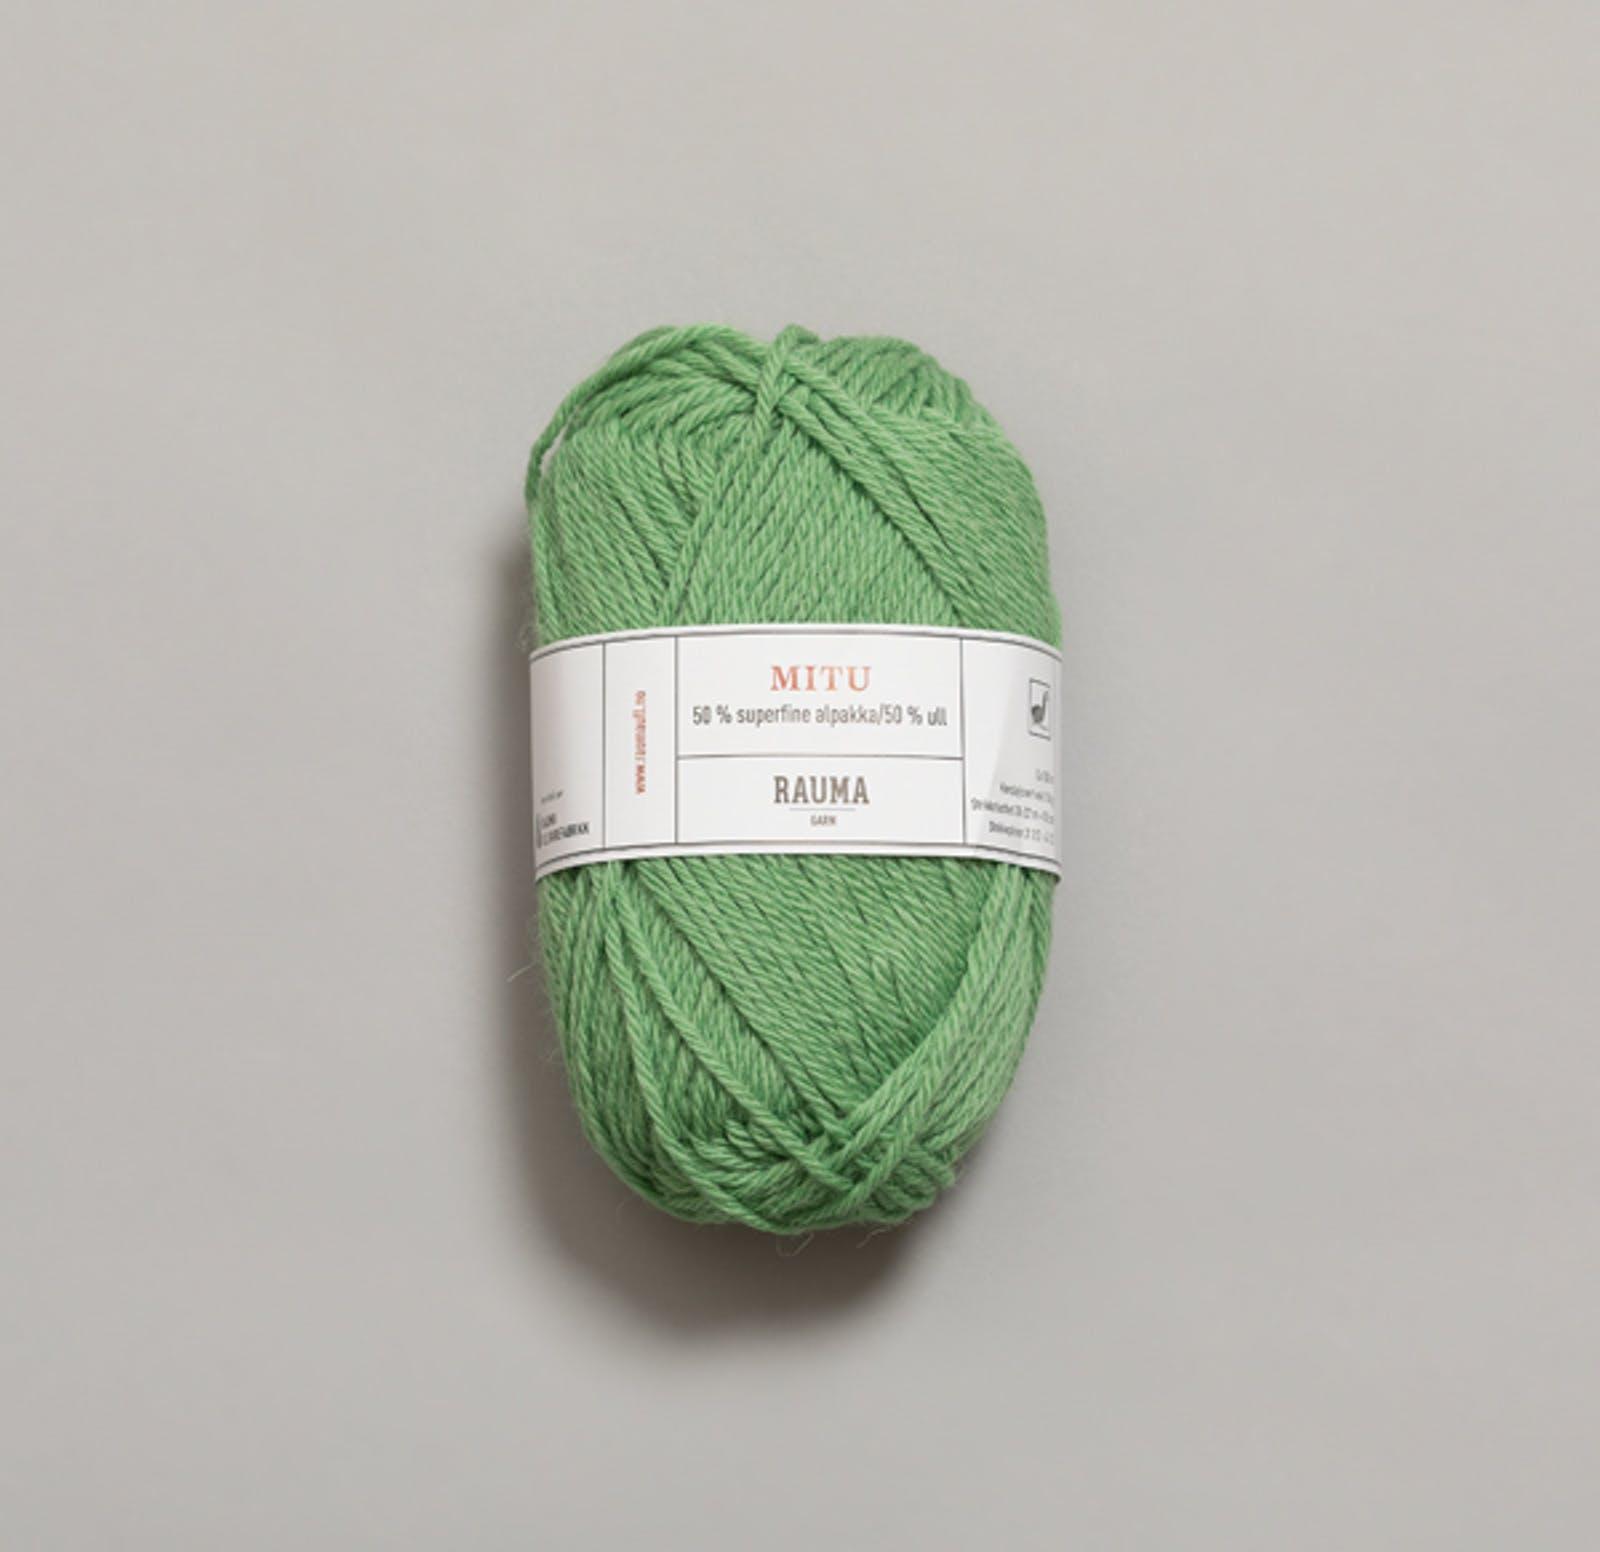 0061 Jadegrøn - MITU